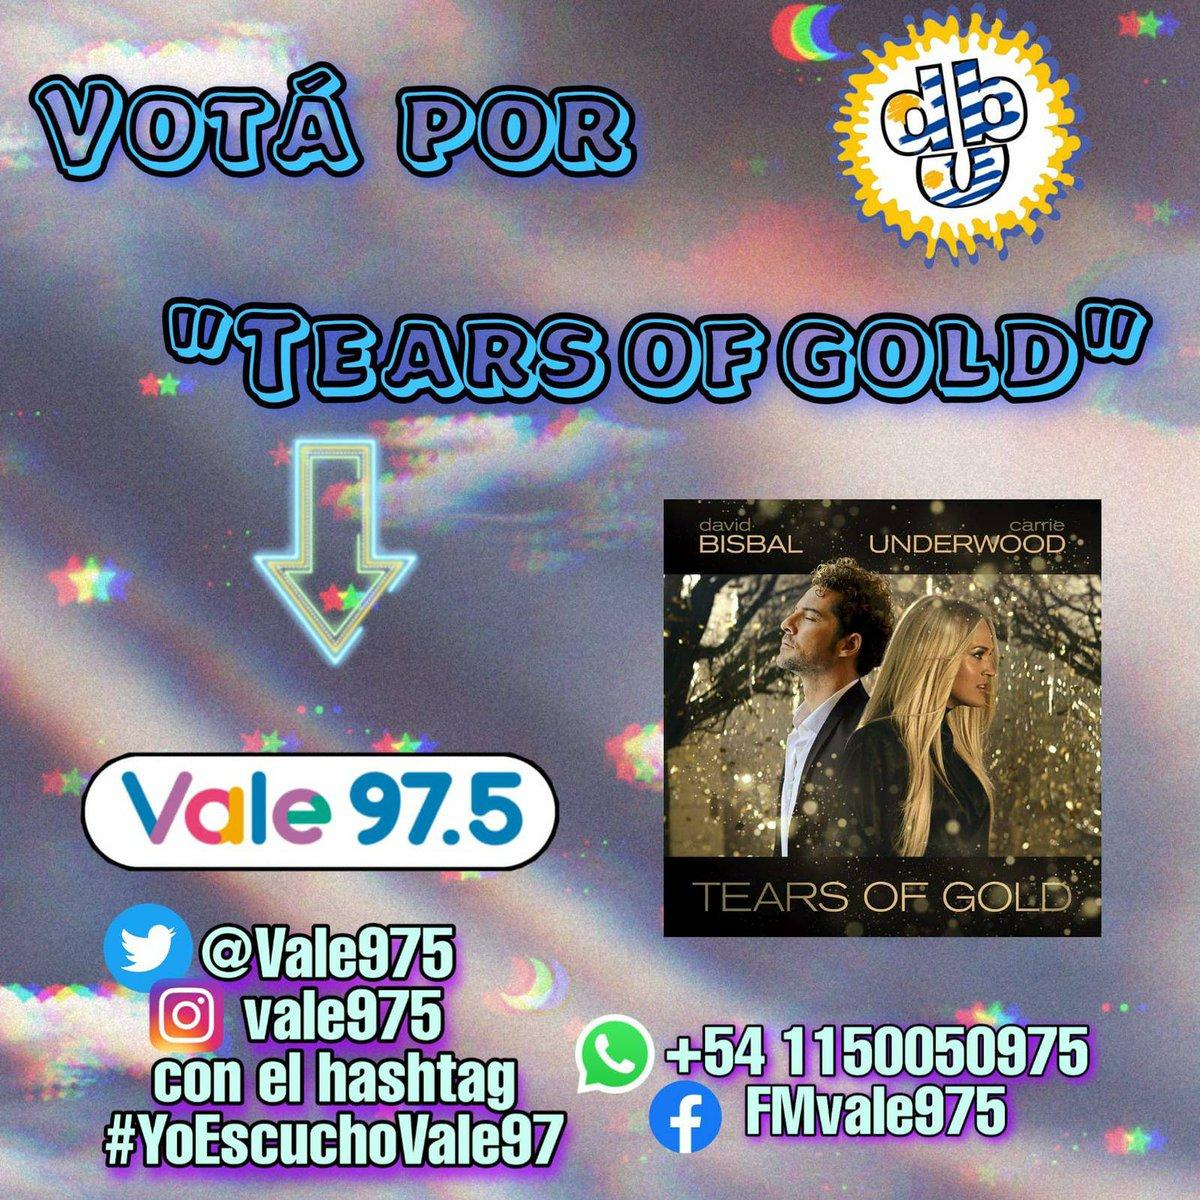 Dejamos nuestro voto en @vale975 para #TearsOfGold de @davidbisbal y @carrieunderwood  #rankingVale #YoEscuchoVale975  @UMArgentina @FCDavidBisbalUY #FCDavidBisbalUruguay